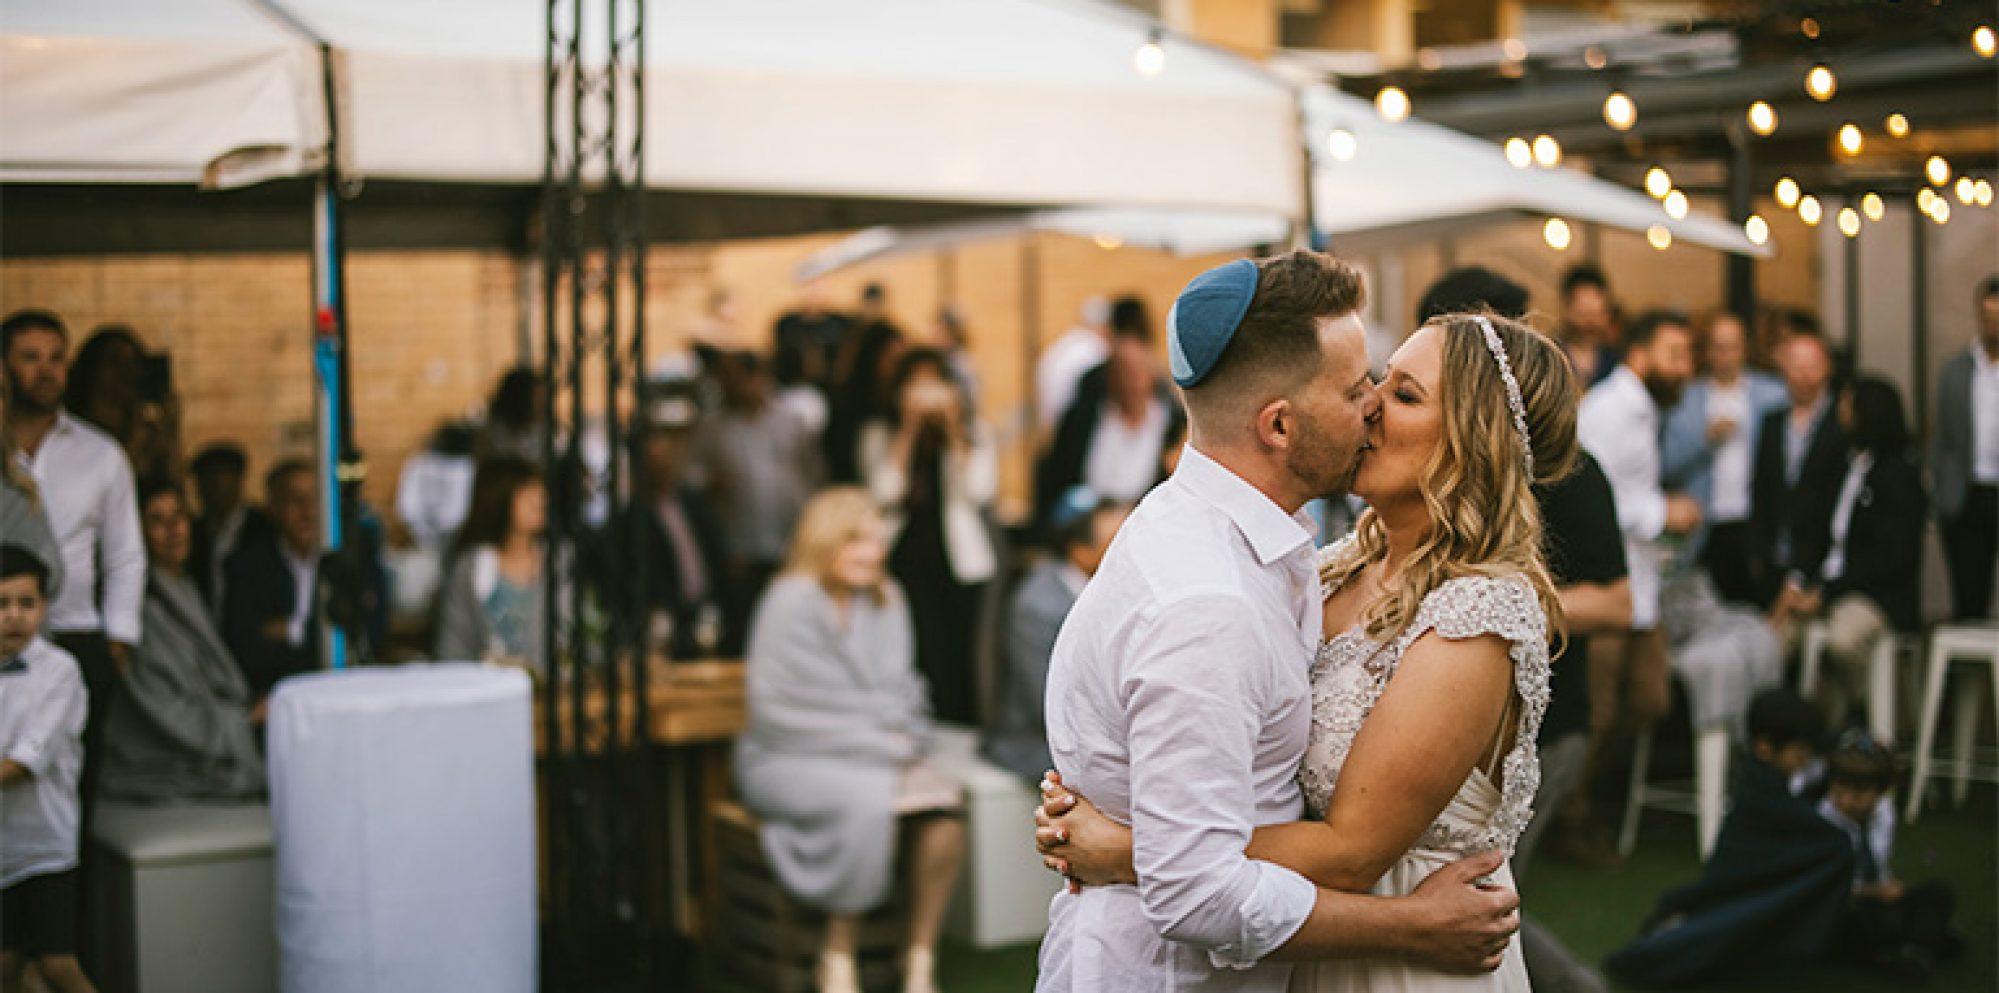 Amy & darren @ jewish wedding videography melbourne